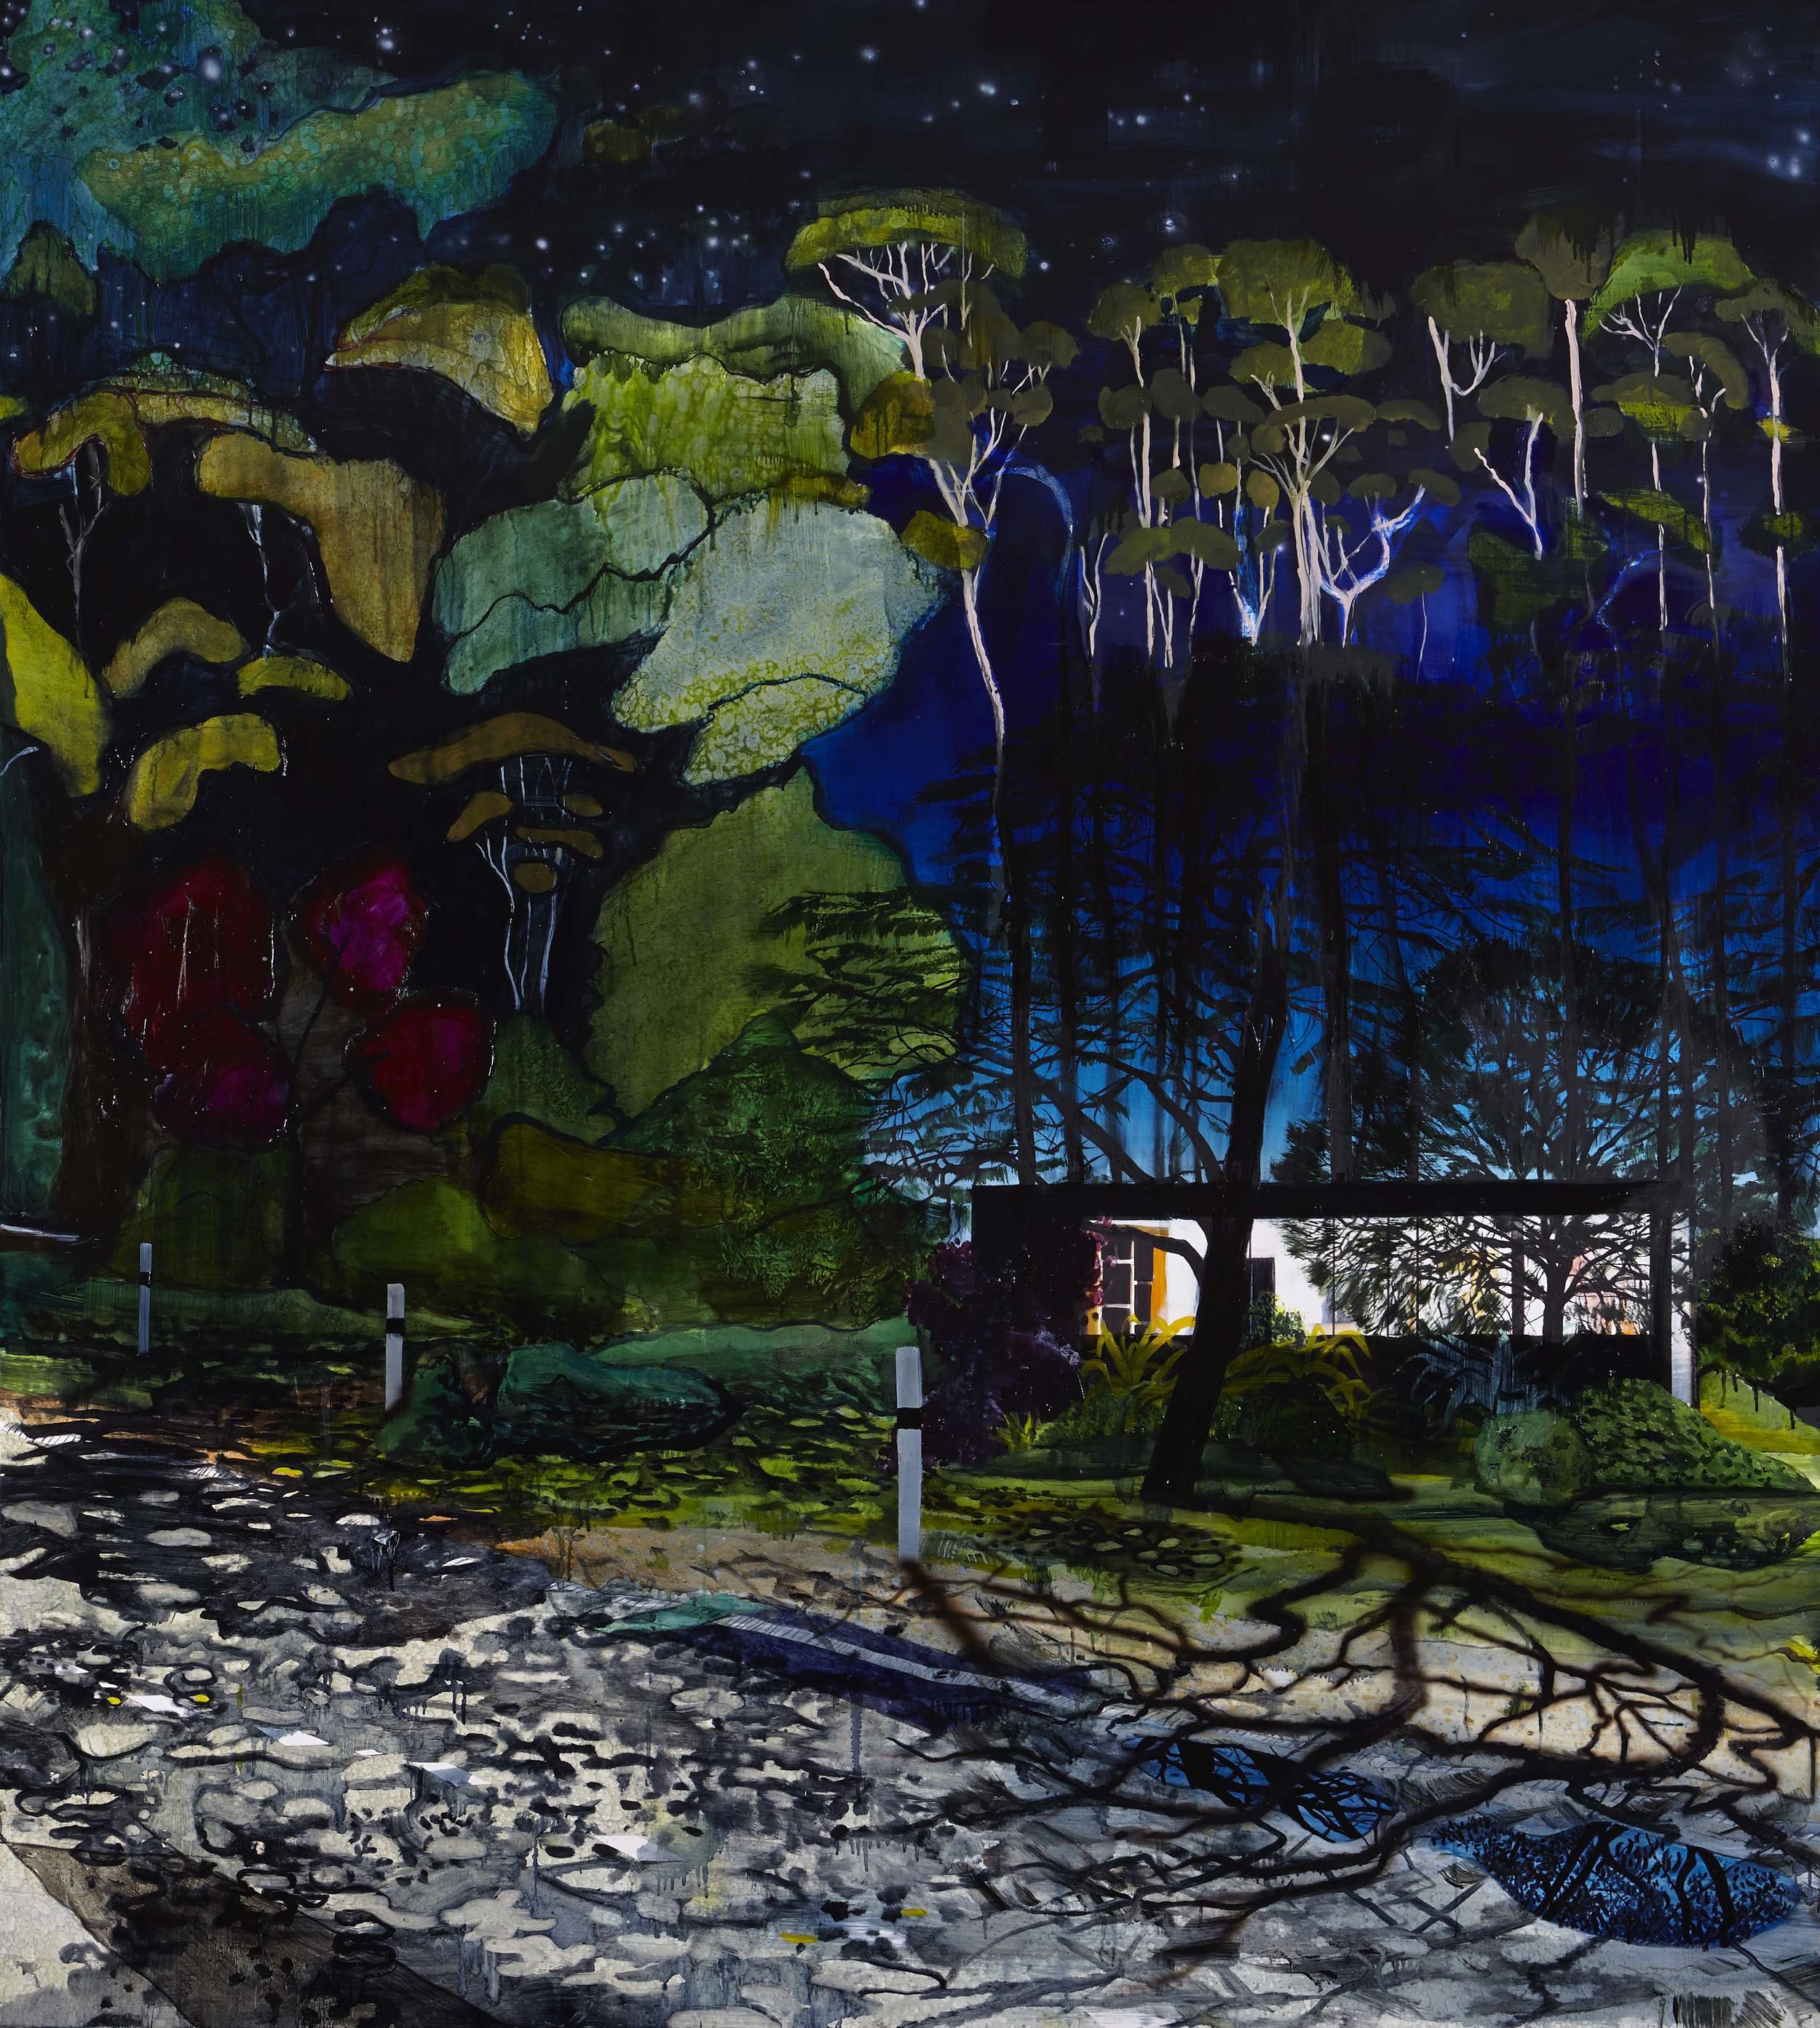 Moonlight (ii),  2014 Acrylic, oil and enamel on linen 200 x 180cm